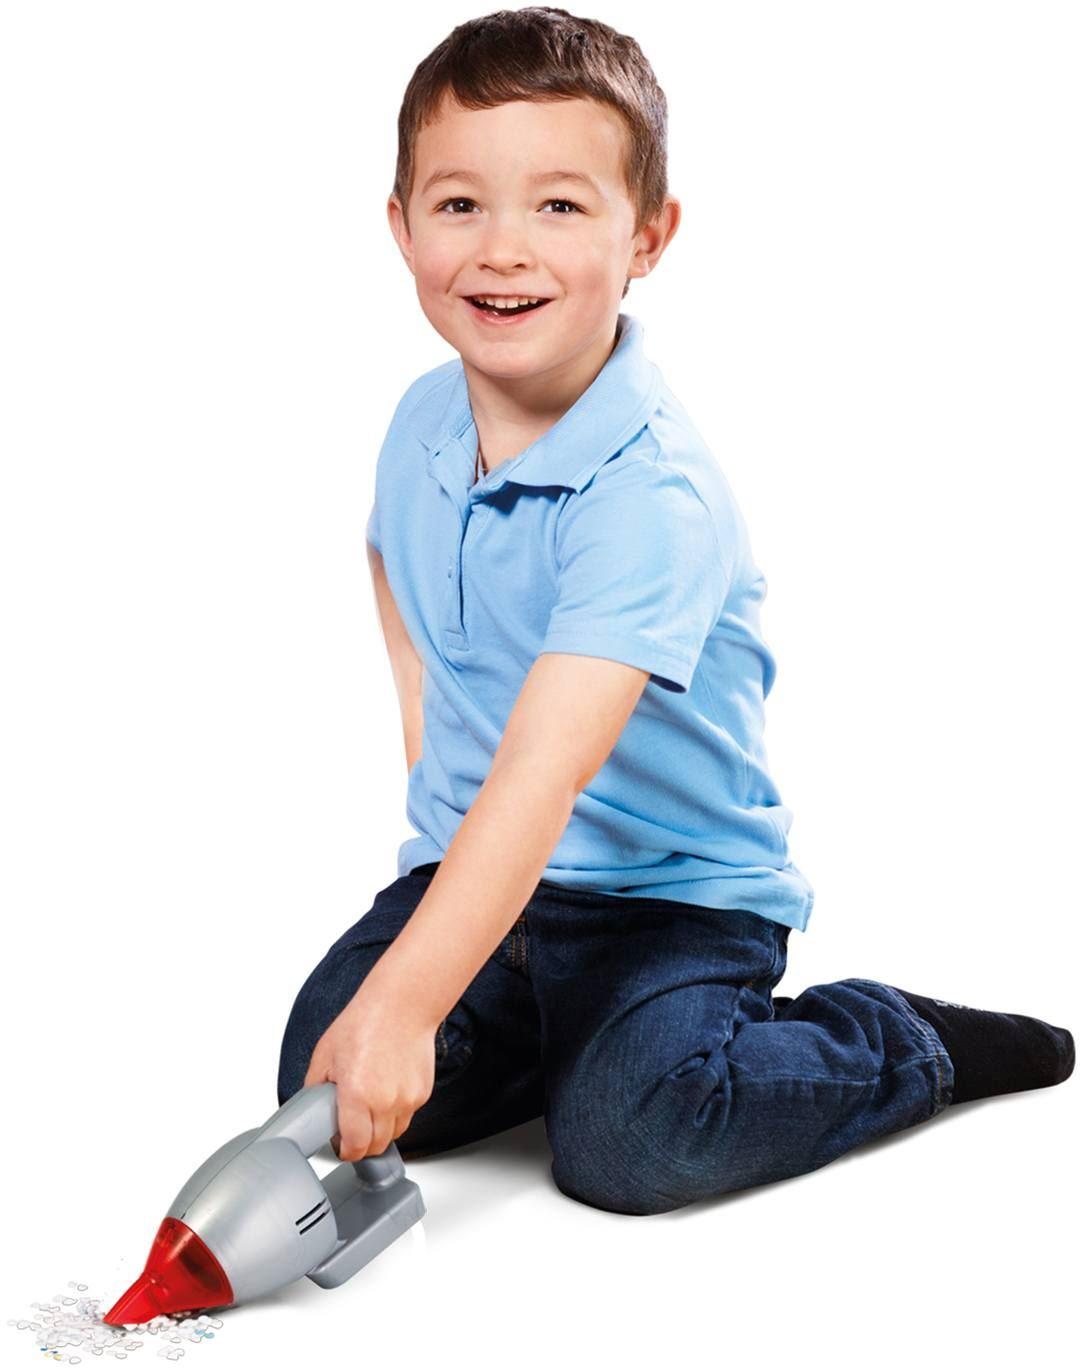 Casdon Henry Hoover Hand Held Vacuum Set Little Helper Role Play Toy//Gift BNIB